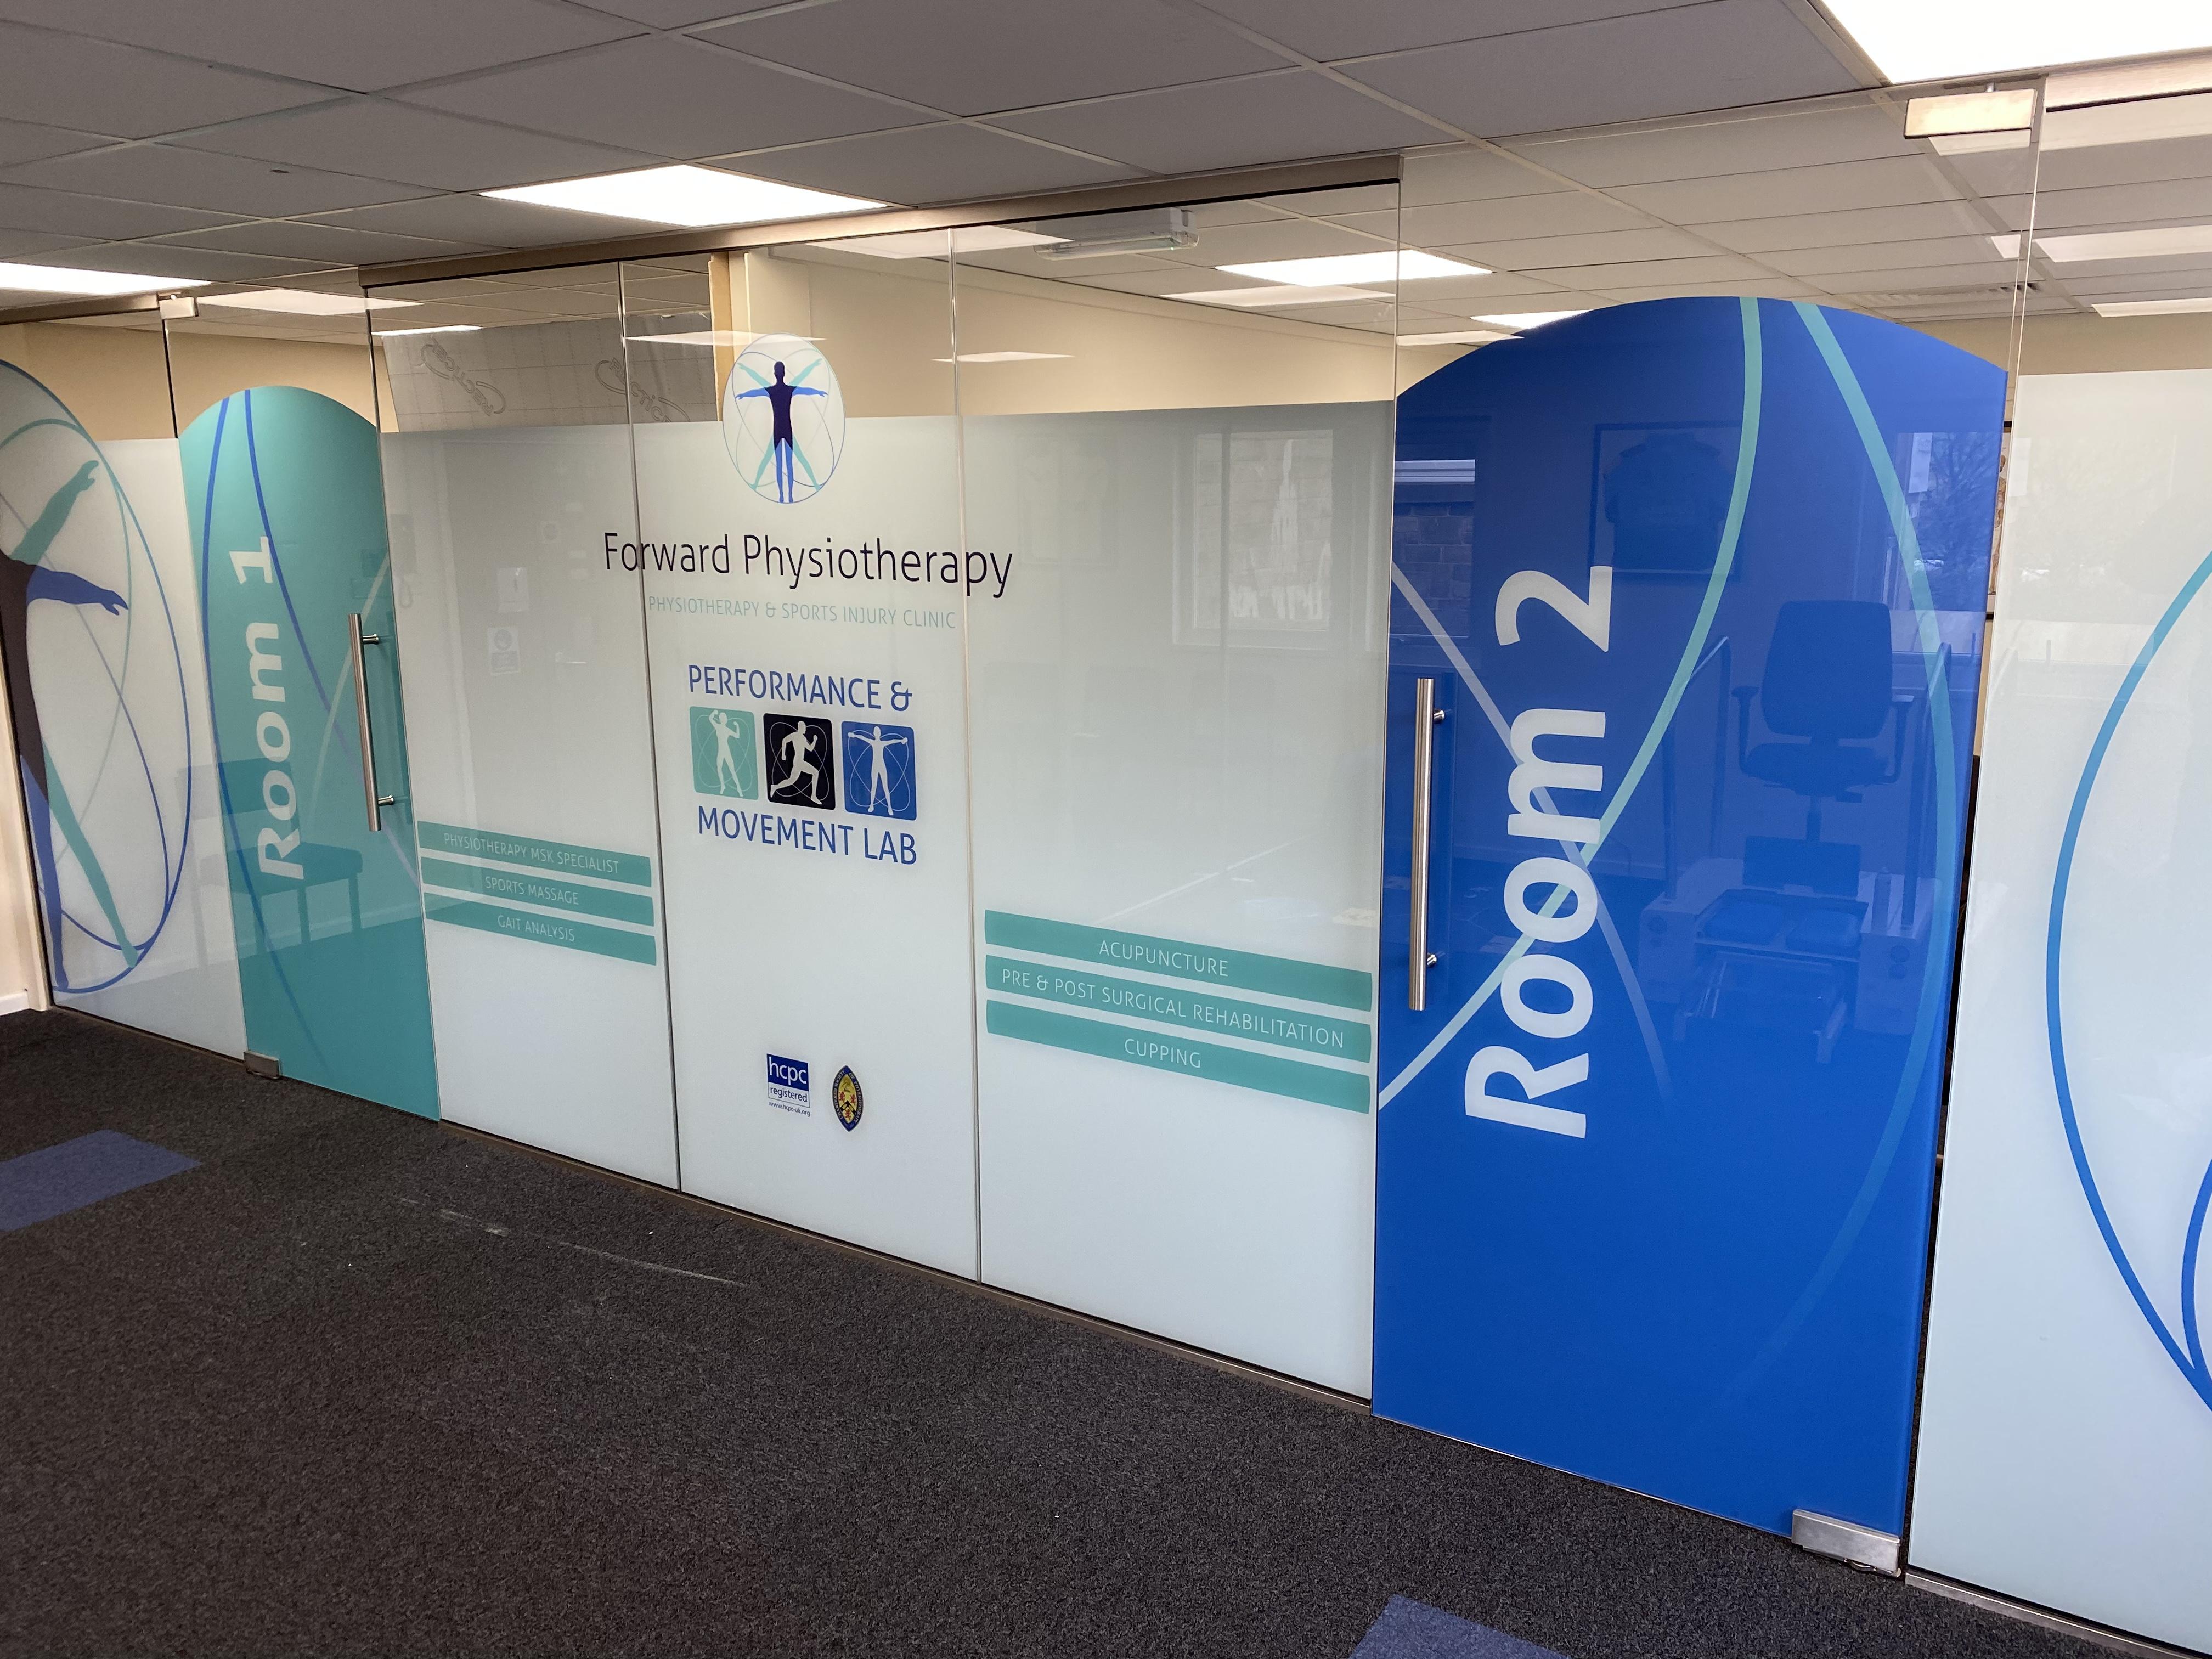 Forward Physio Room